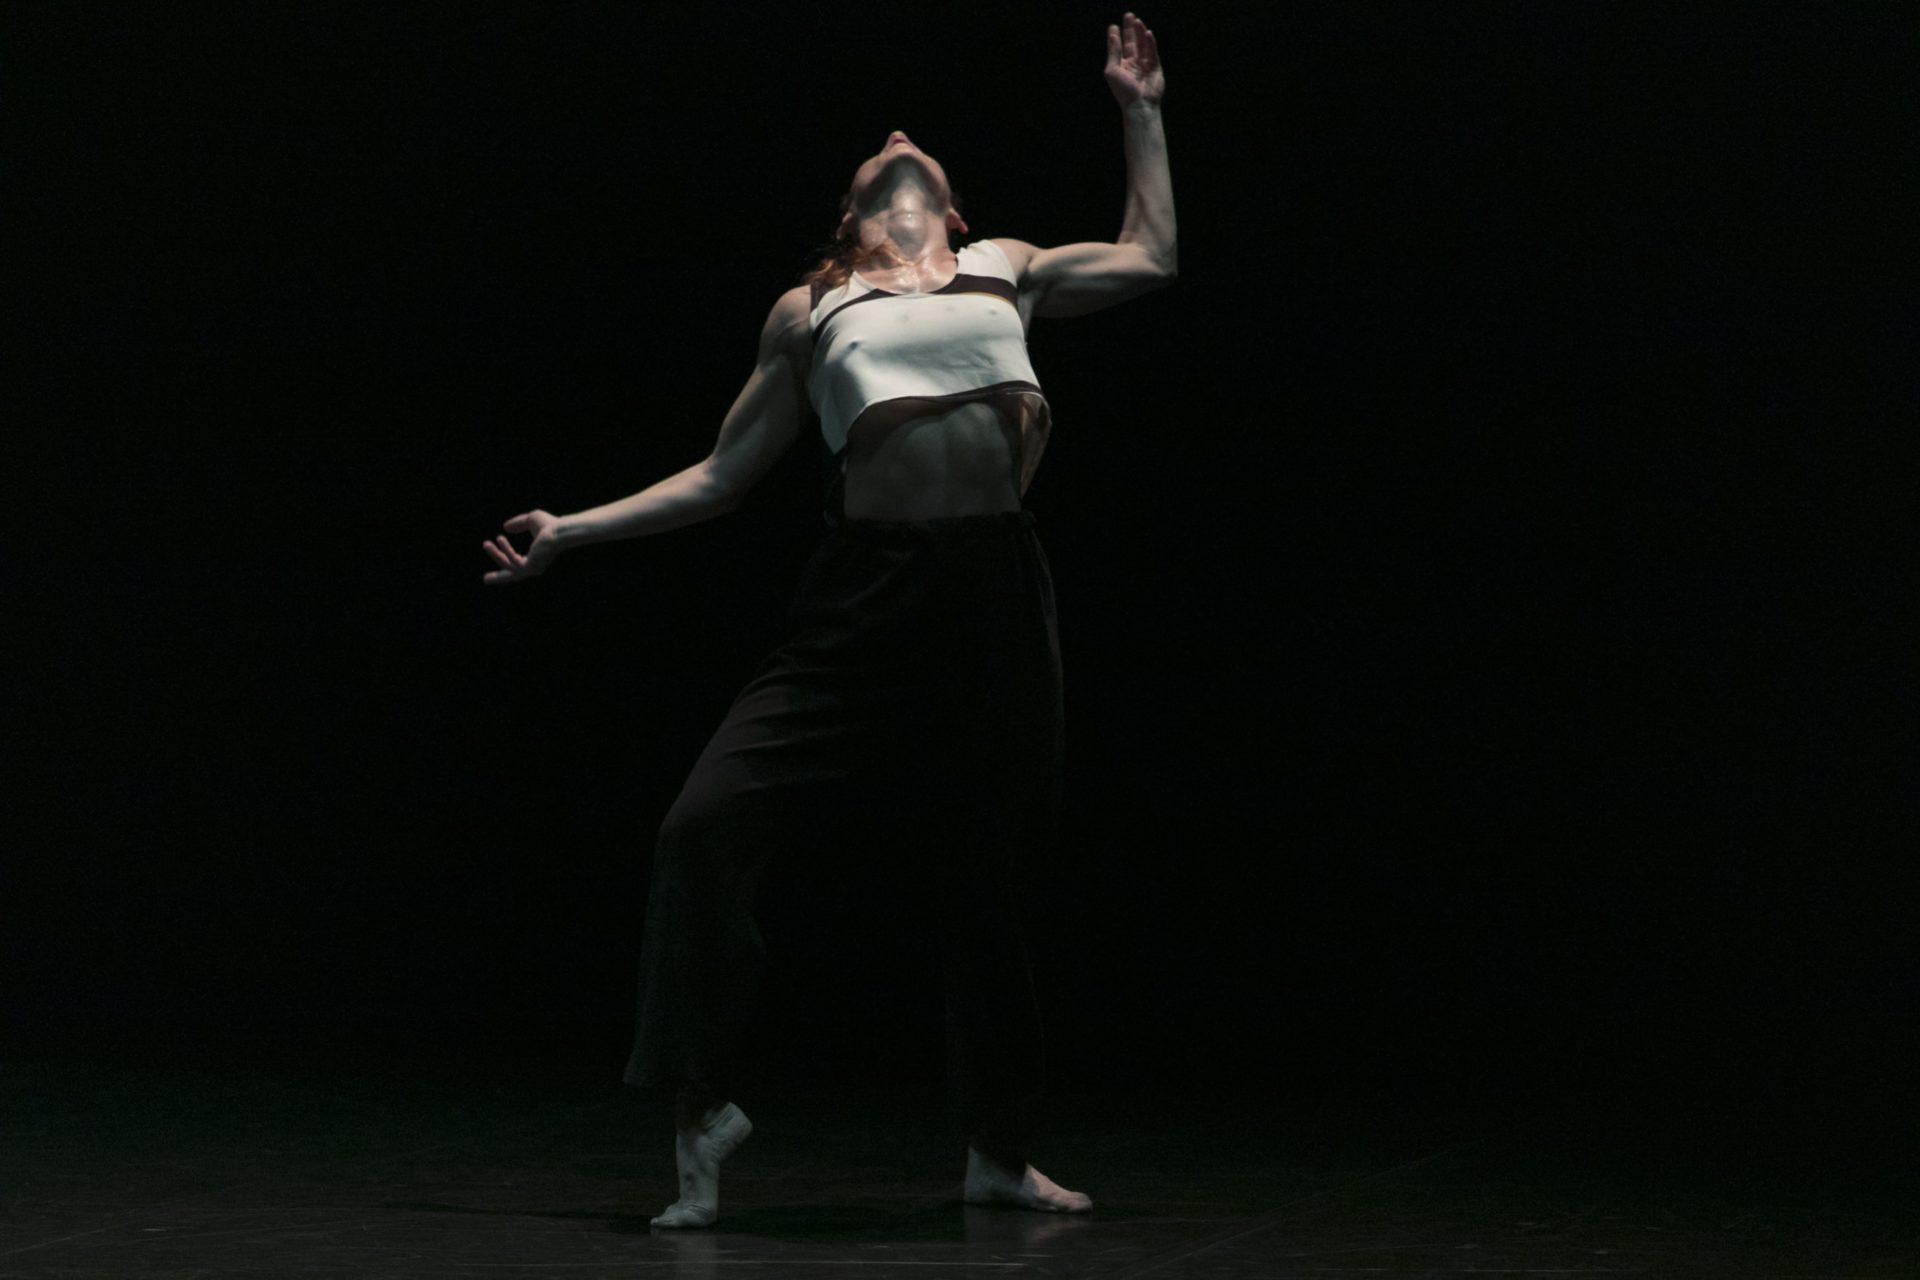 Labile pangea / Manfredi Perego / ph. Federica Capo / TIR Danza